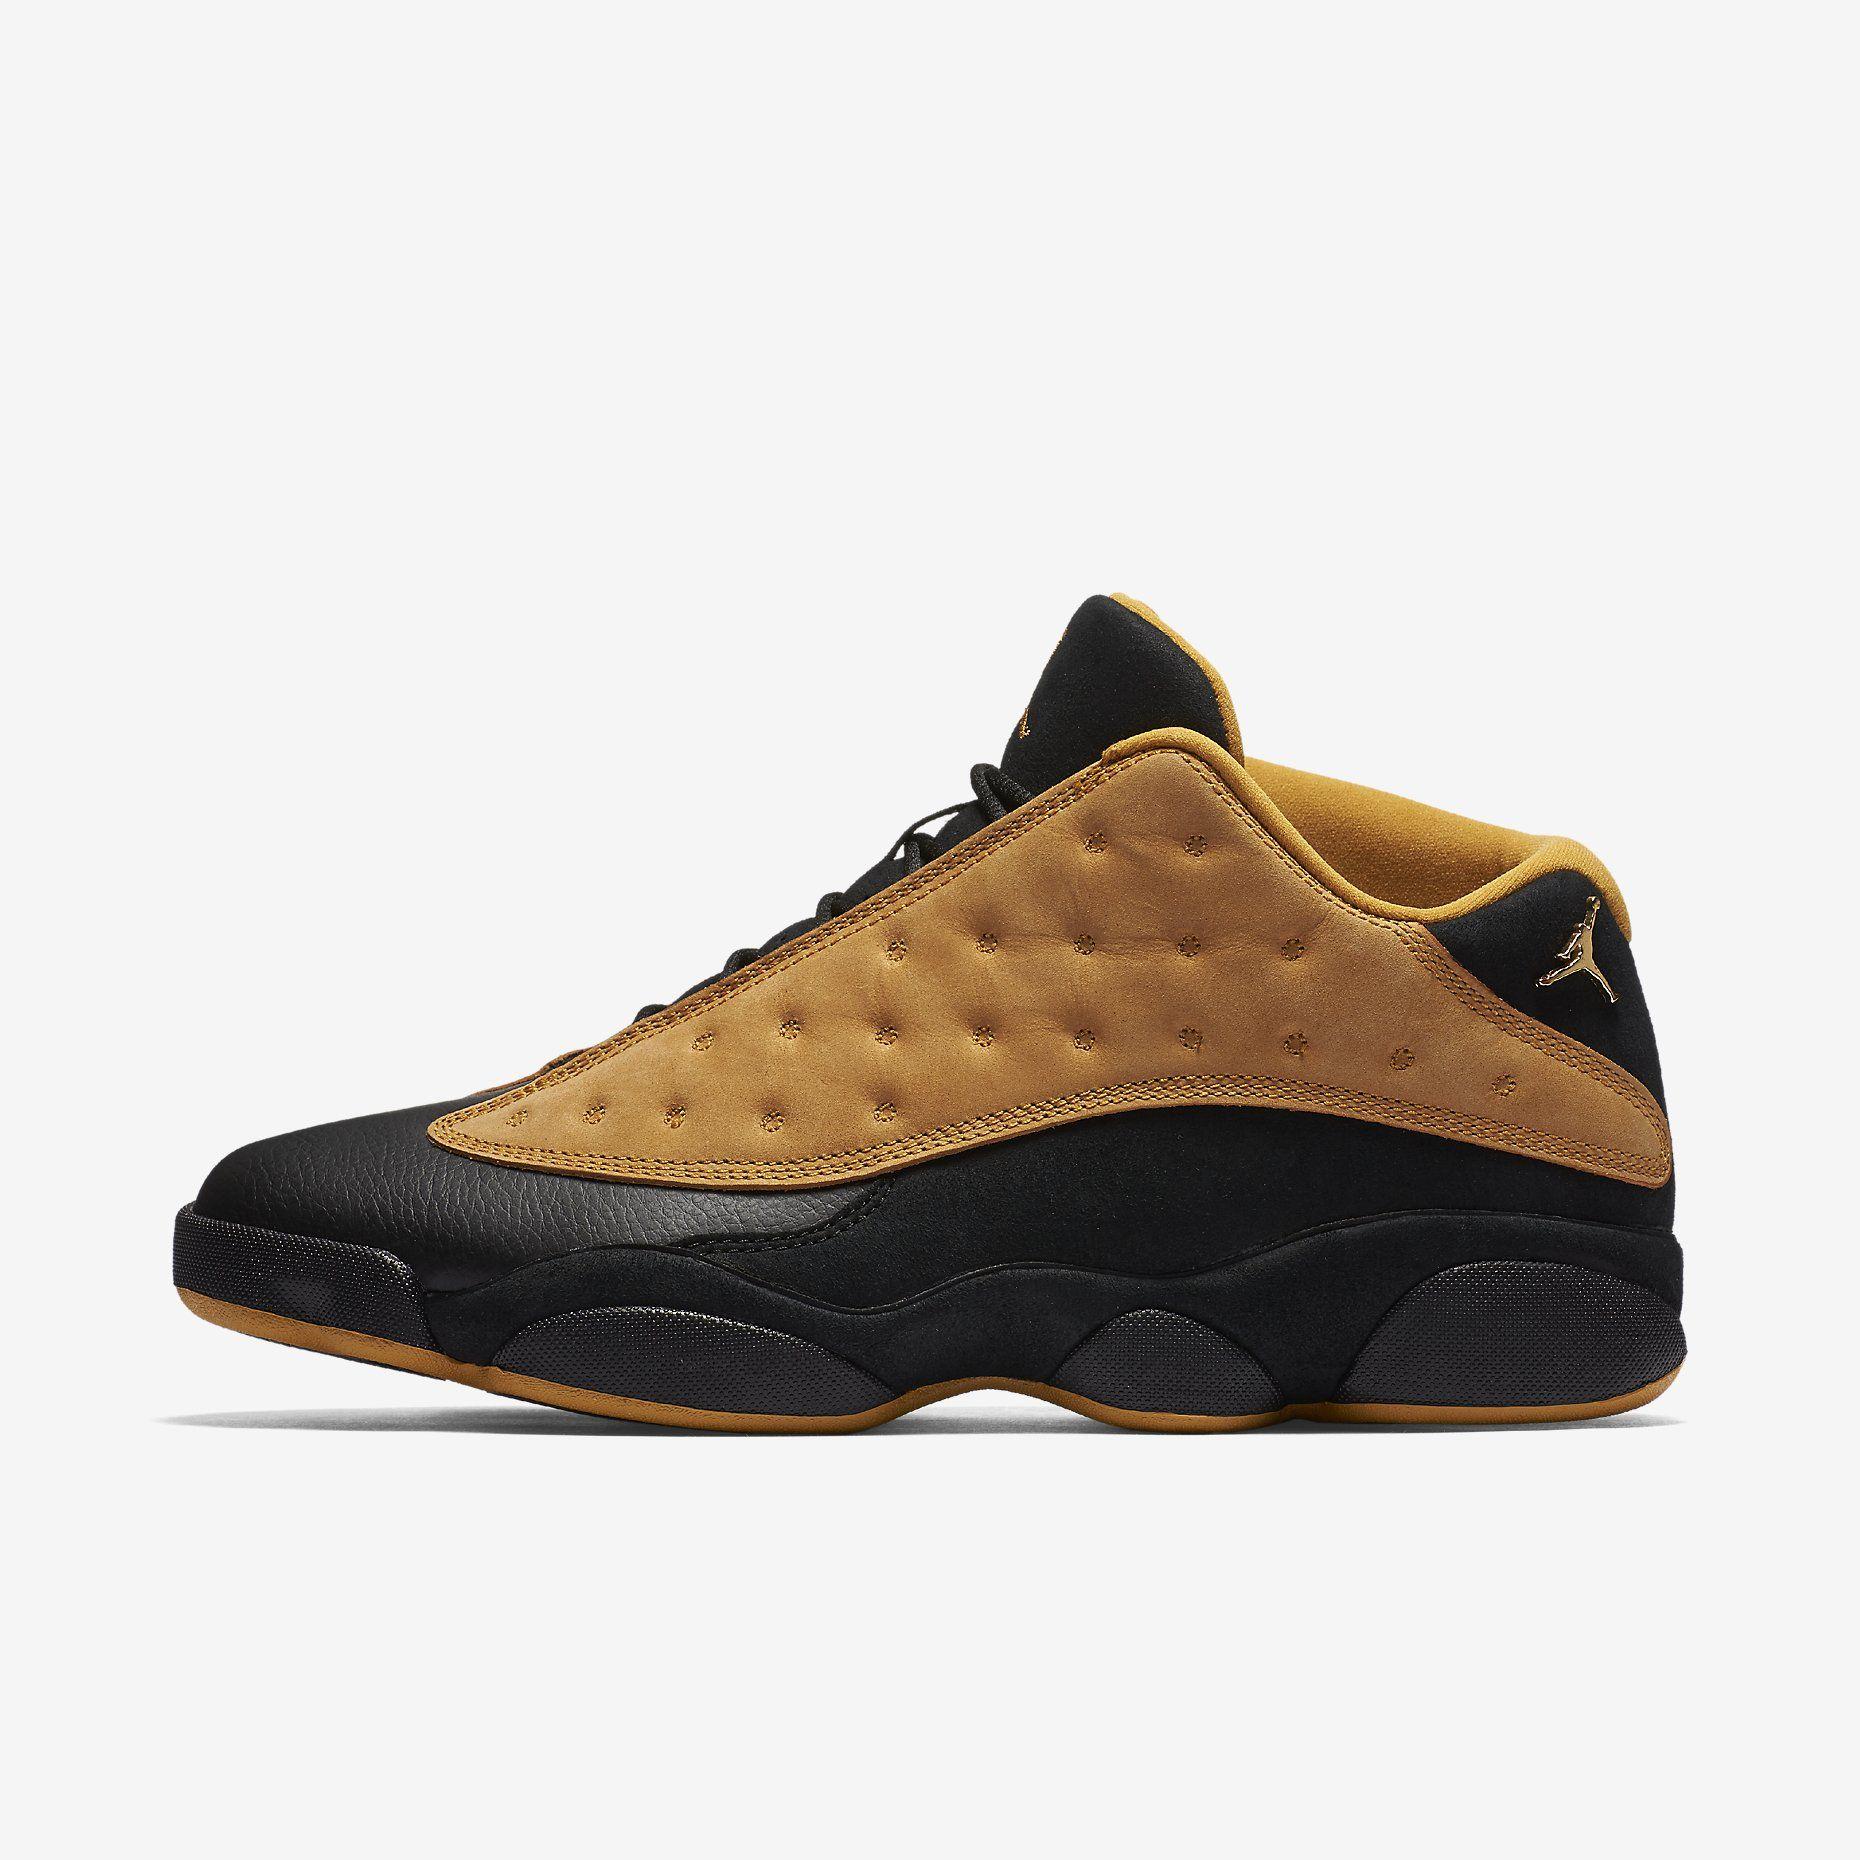 7301401929afcb usa nike air jordan retro 13 low chutney black 310810 022 zadehkicks 85b98  5b8e3  order shop nike for shoes clothing gear at nike 6bc3a 0ccad